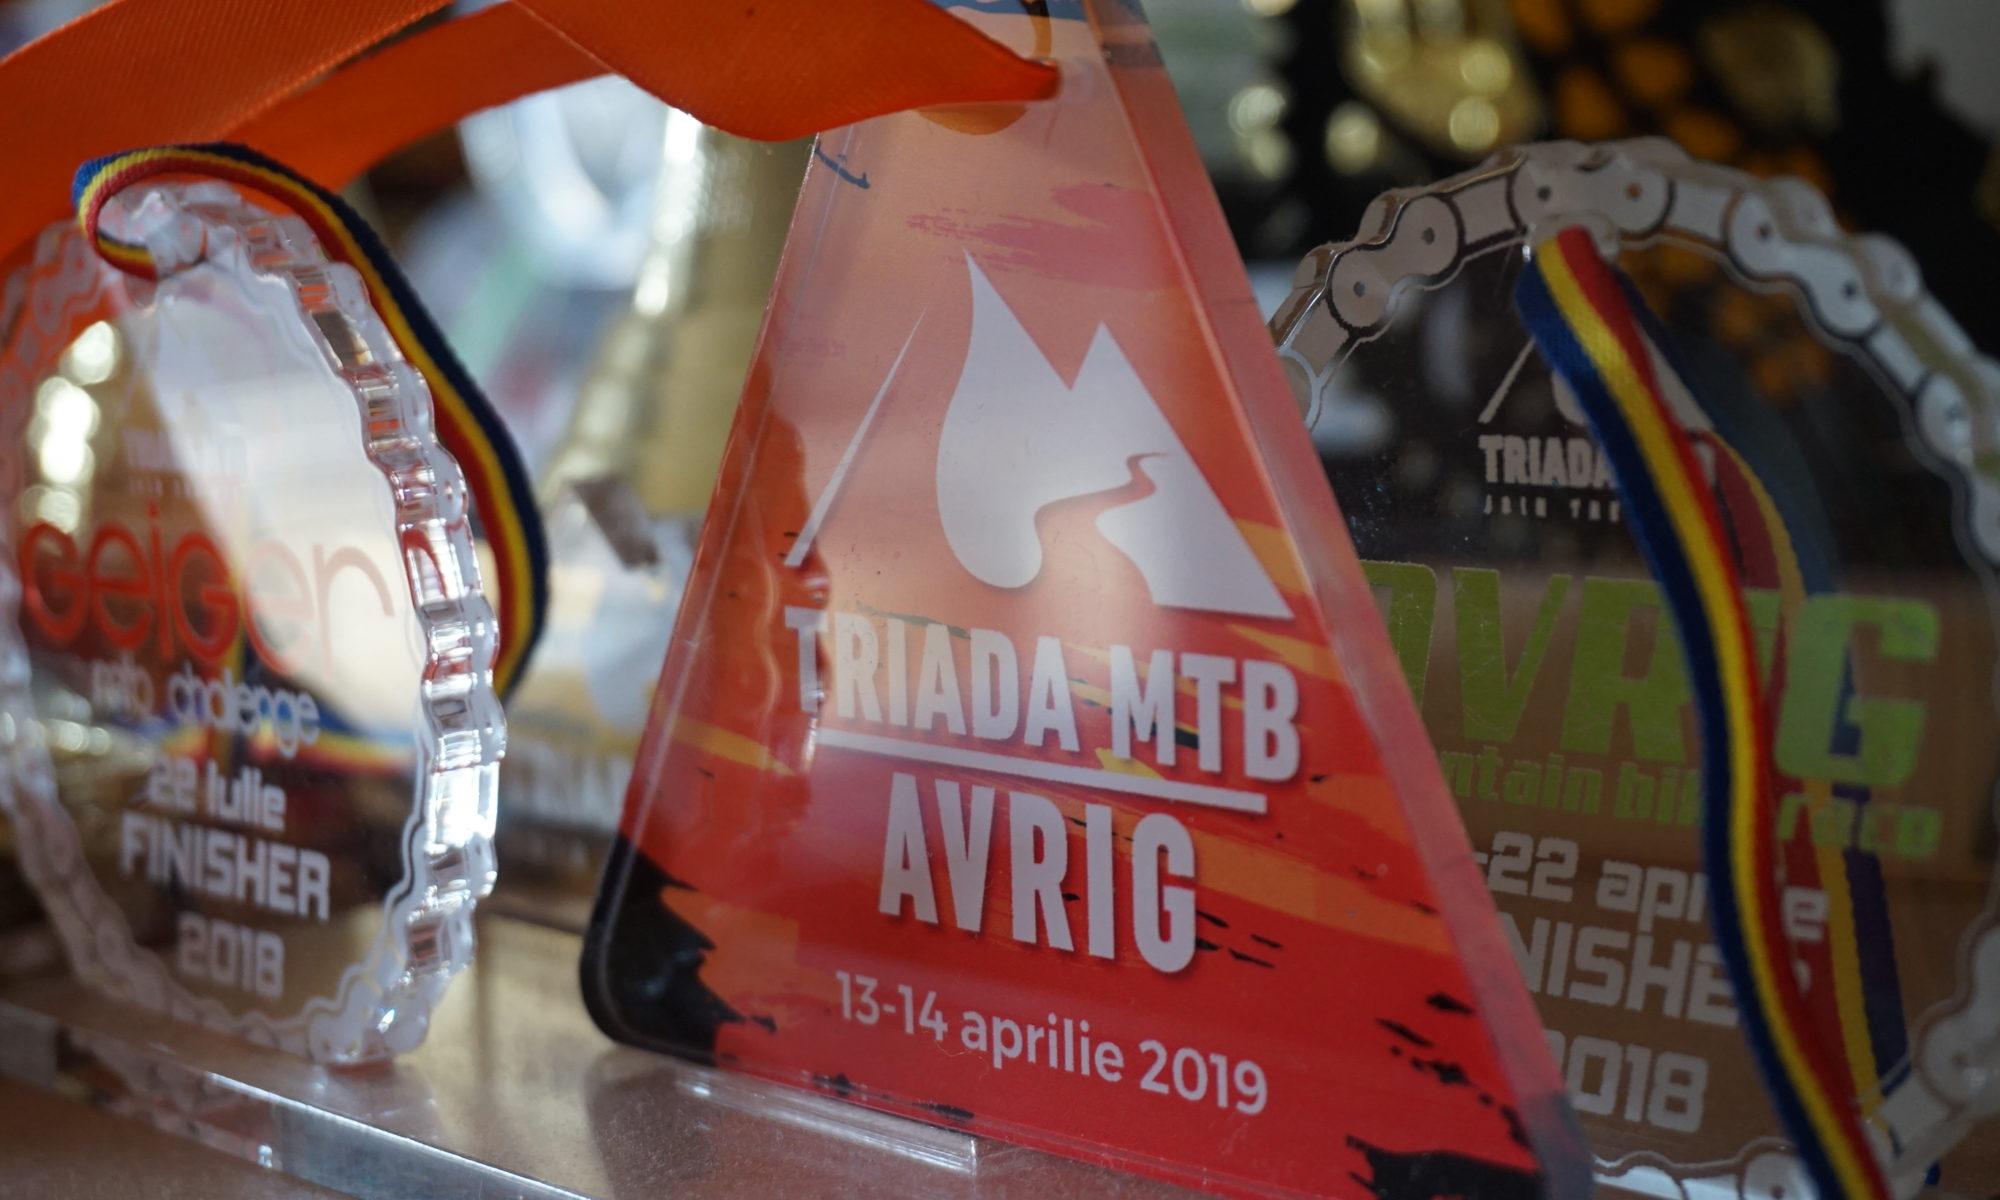 Avrig Mtb Race